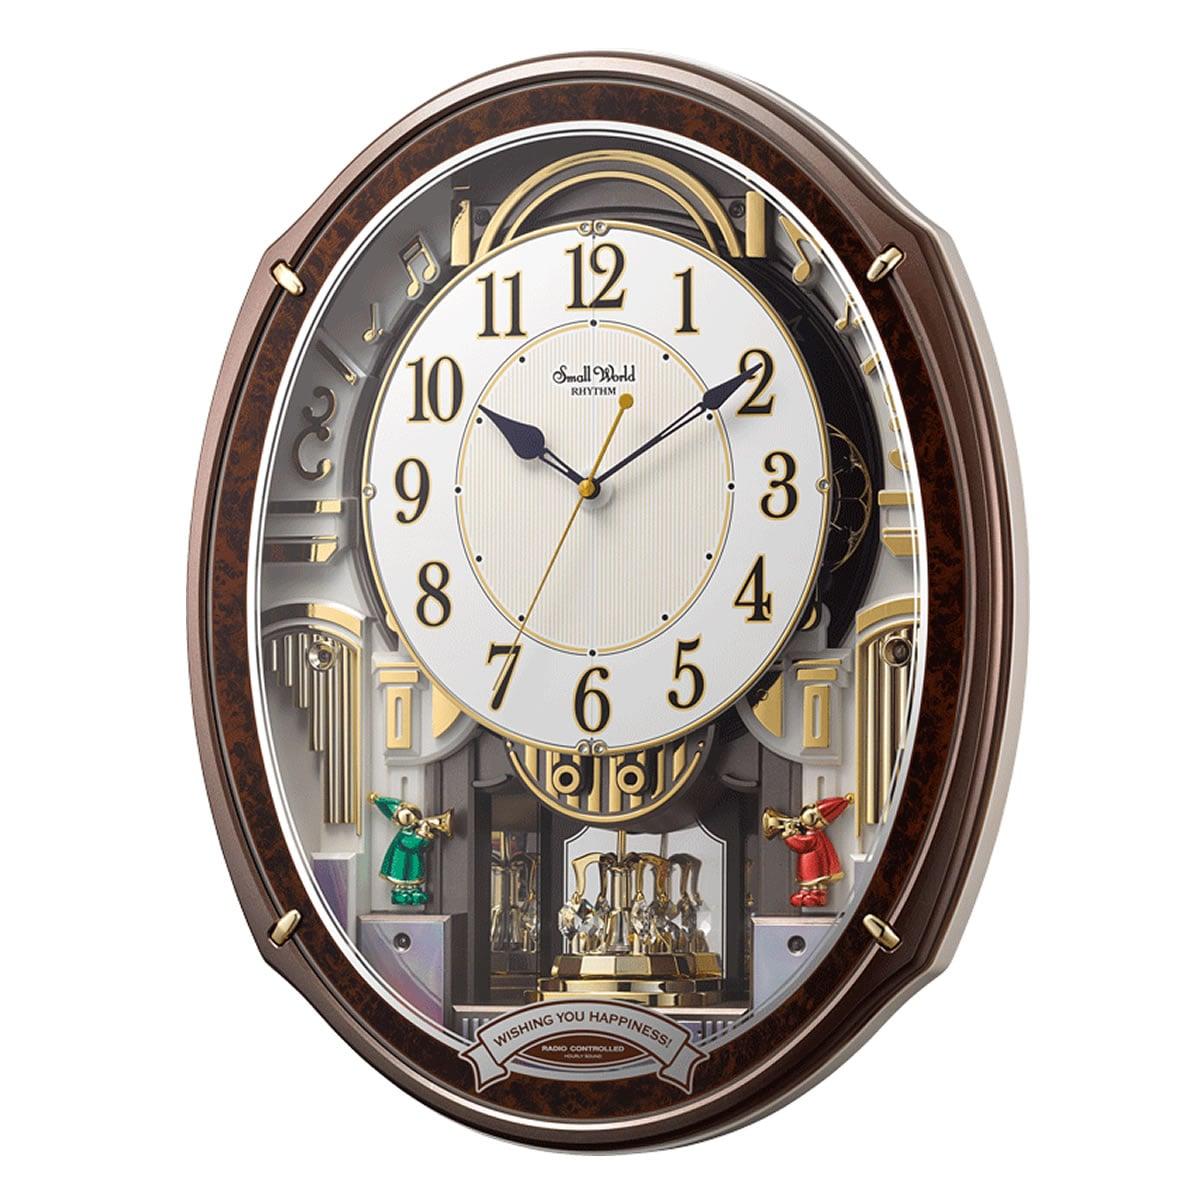 RHYTHM リズム SmallWorld 電波からくり掛け時計 スモールワールドアルディ【4MN545RH23】